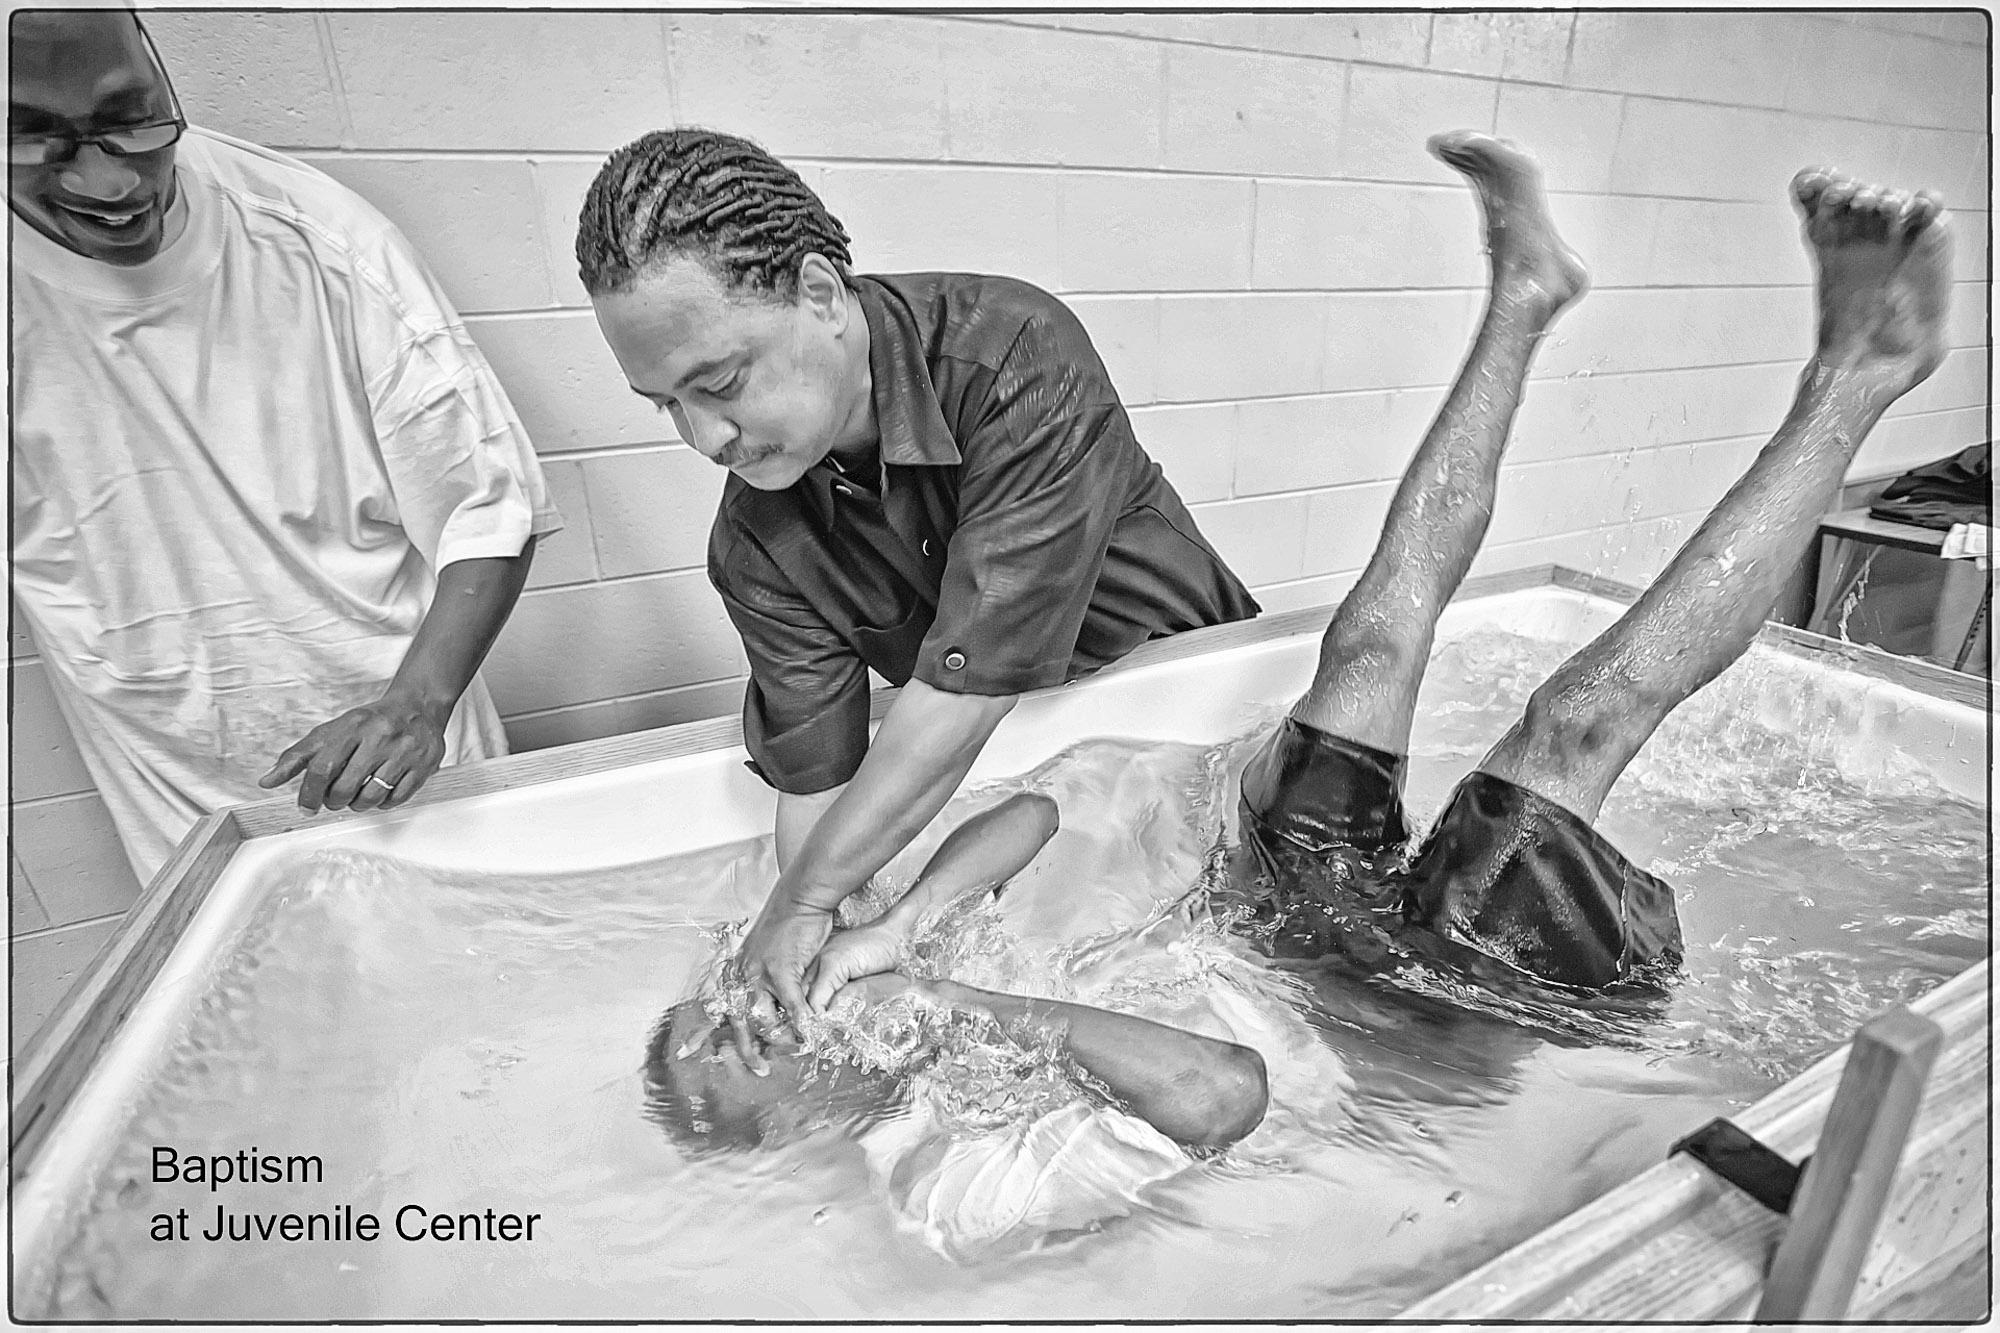 jc-baptism.jpg